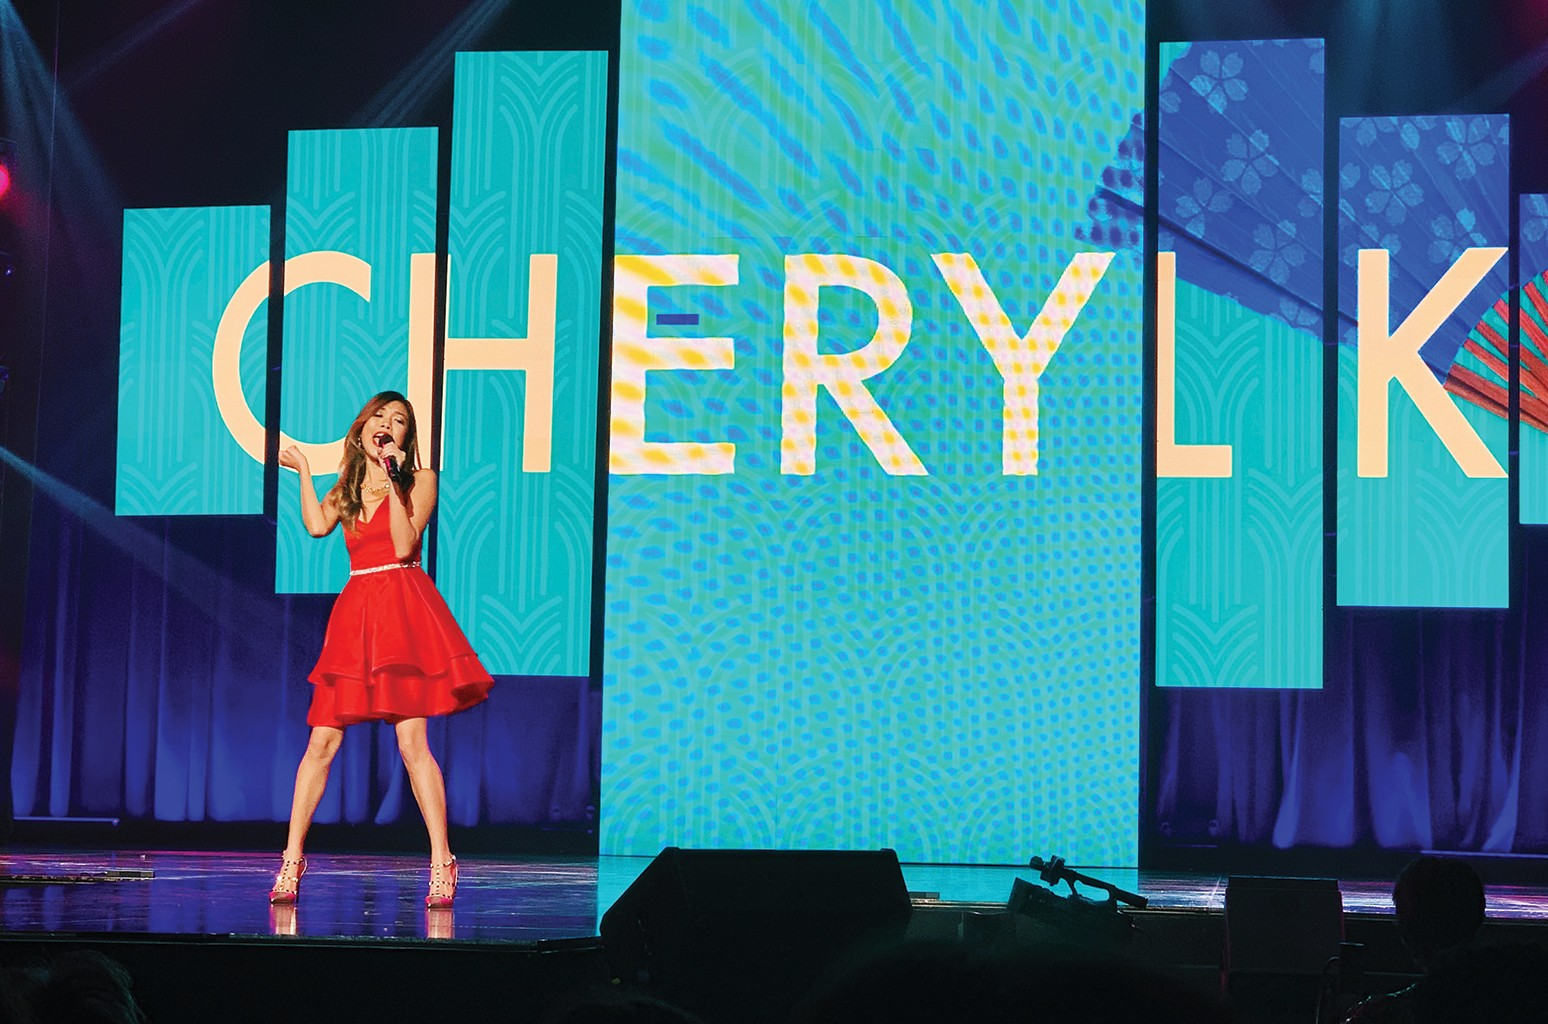 Cheryl Koh